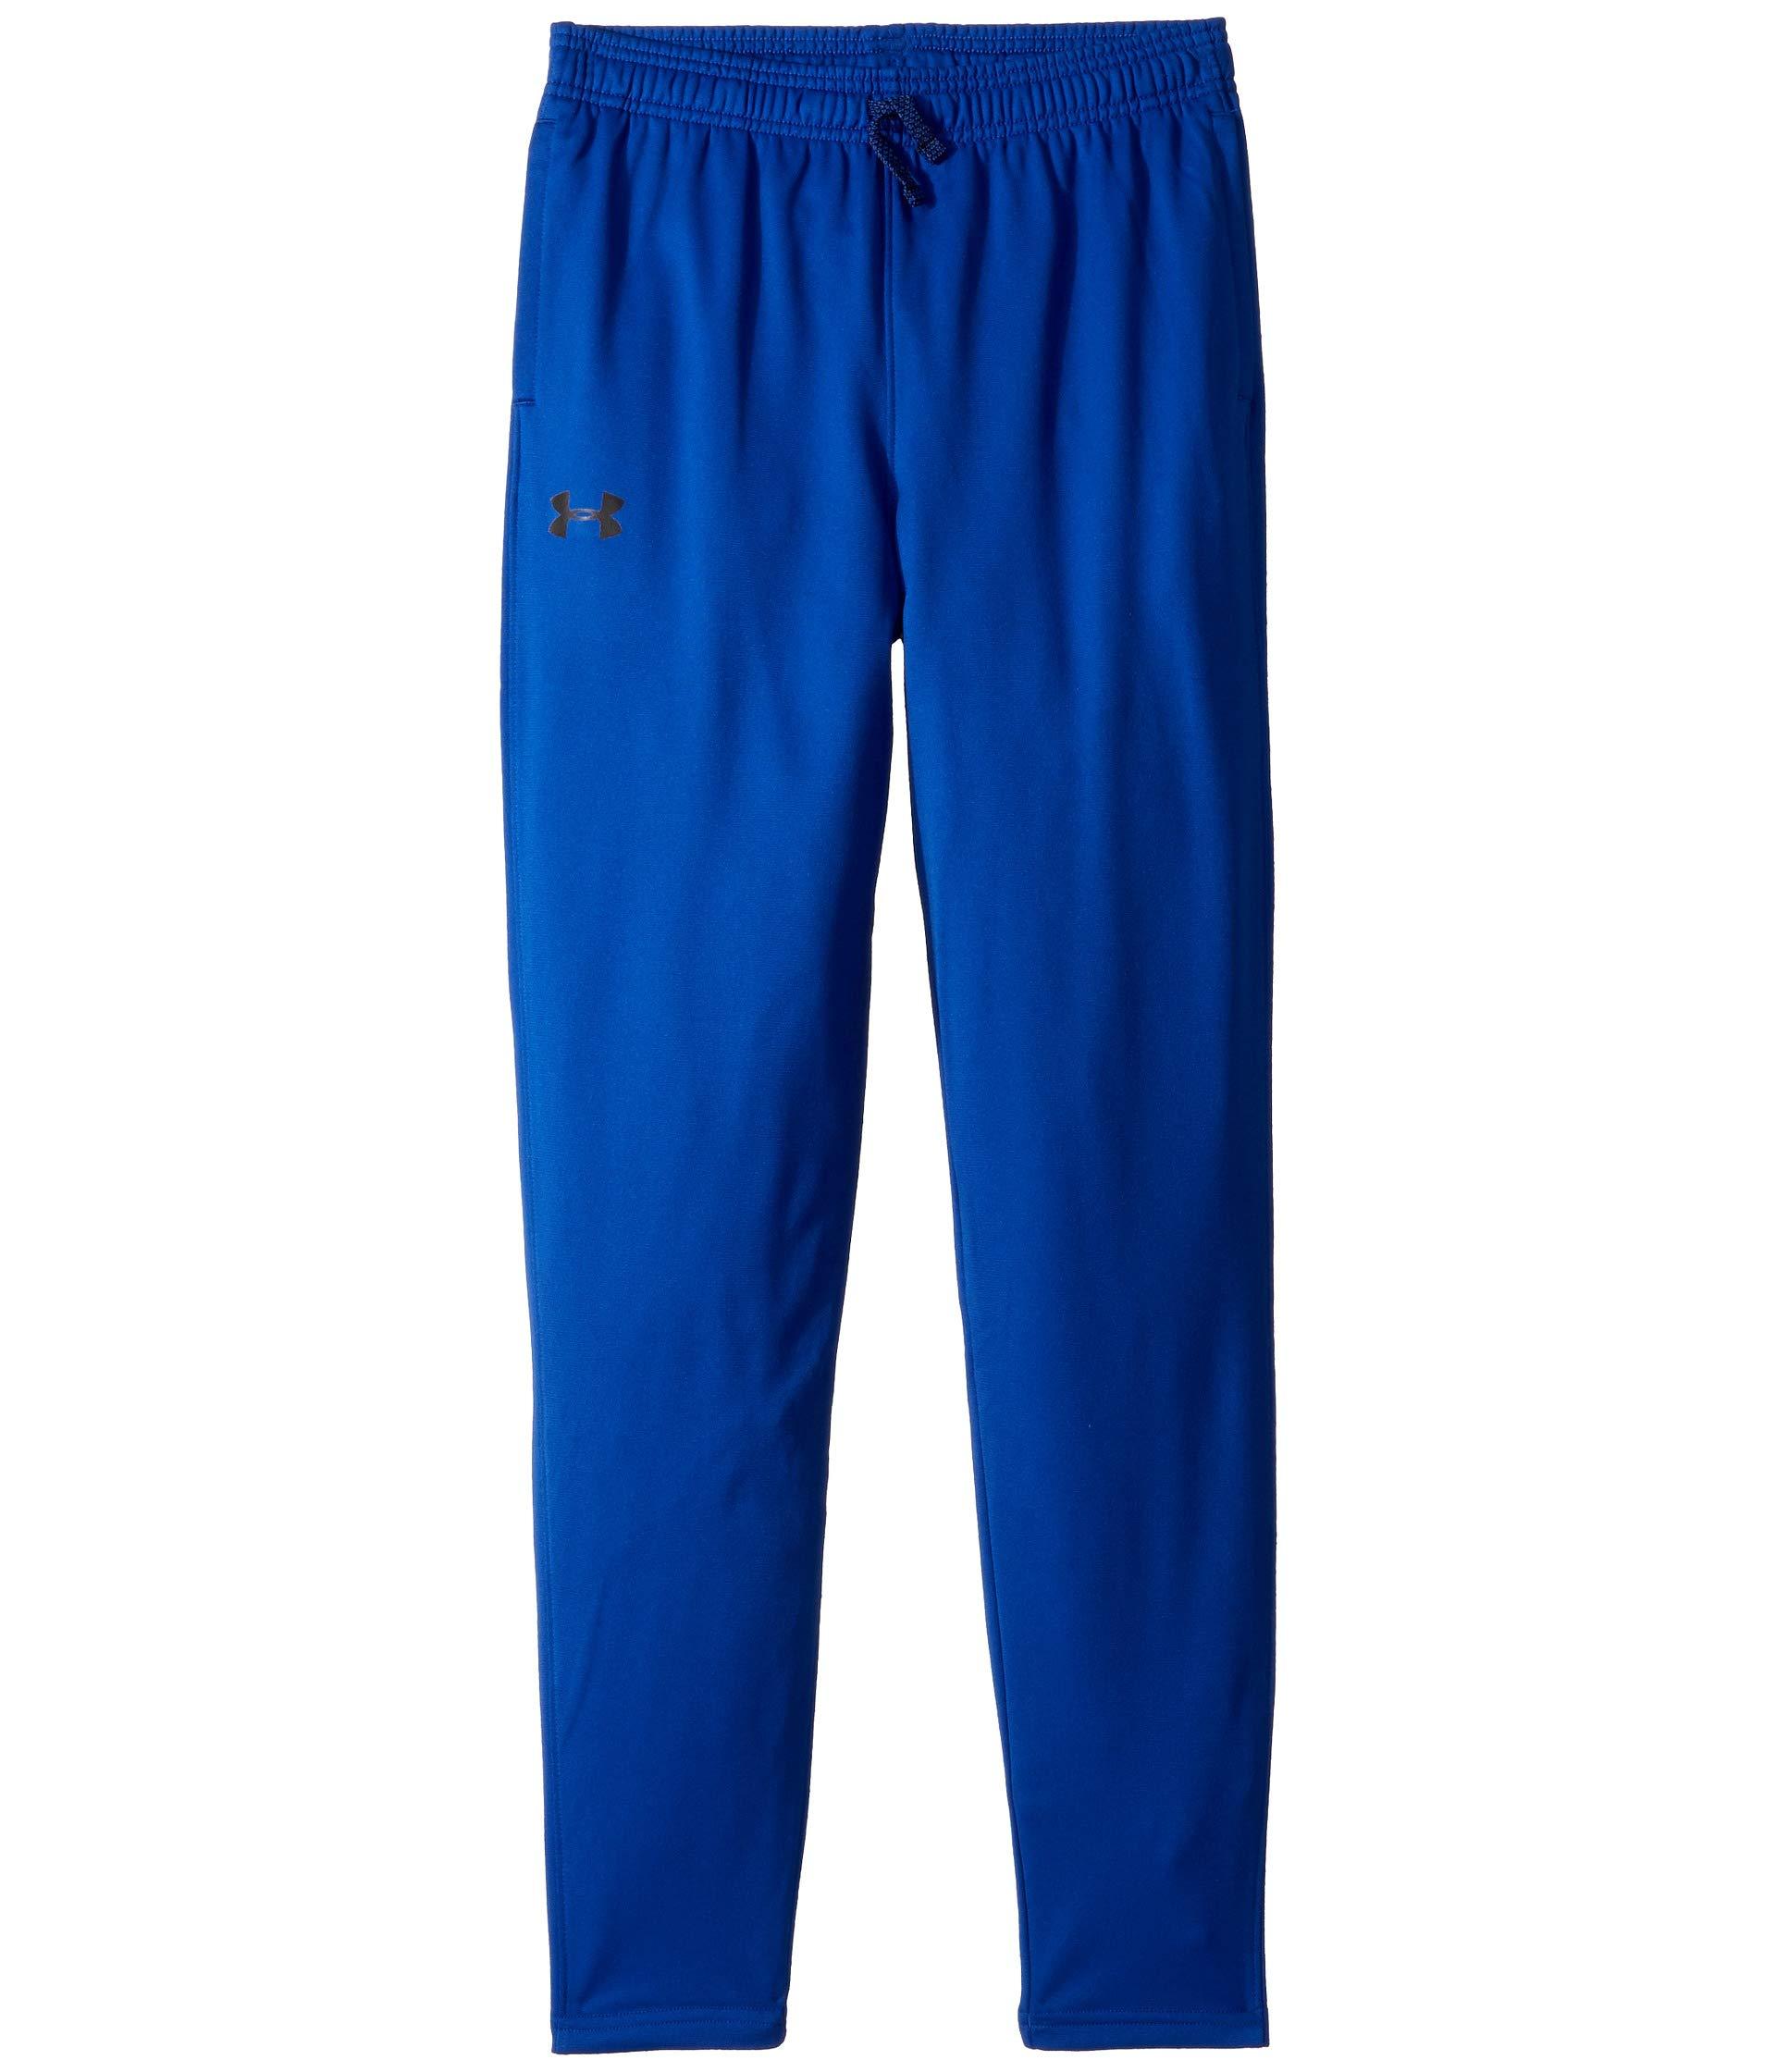 Under Armour Kids Boy's Brawler Tapered Pants (Big Kids) Royal/Black X-Small